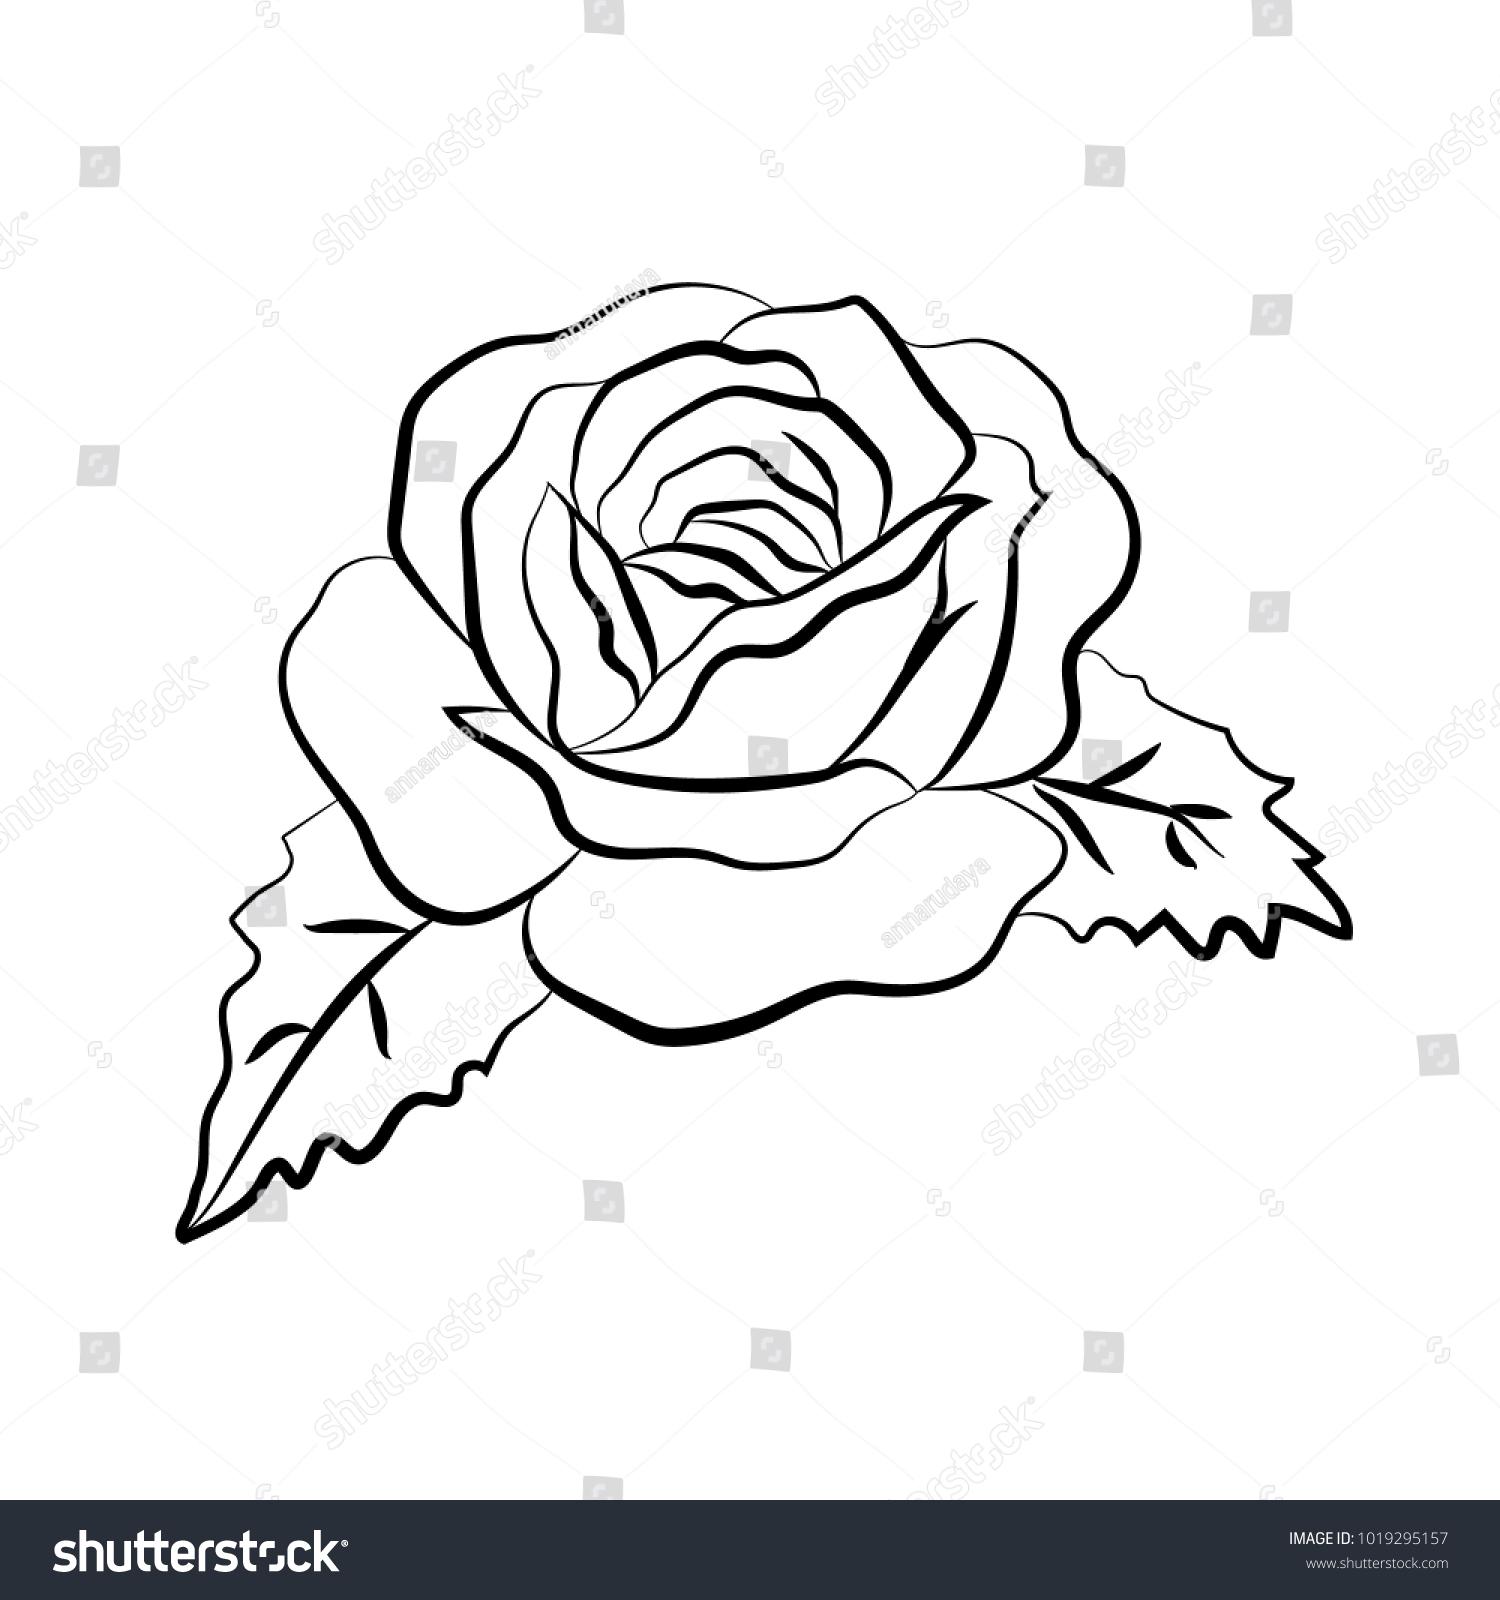 Rose Vector Illustration Rose Outline Doodle Stock Vector Royalty